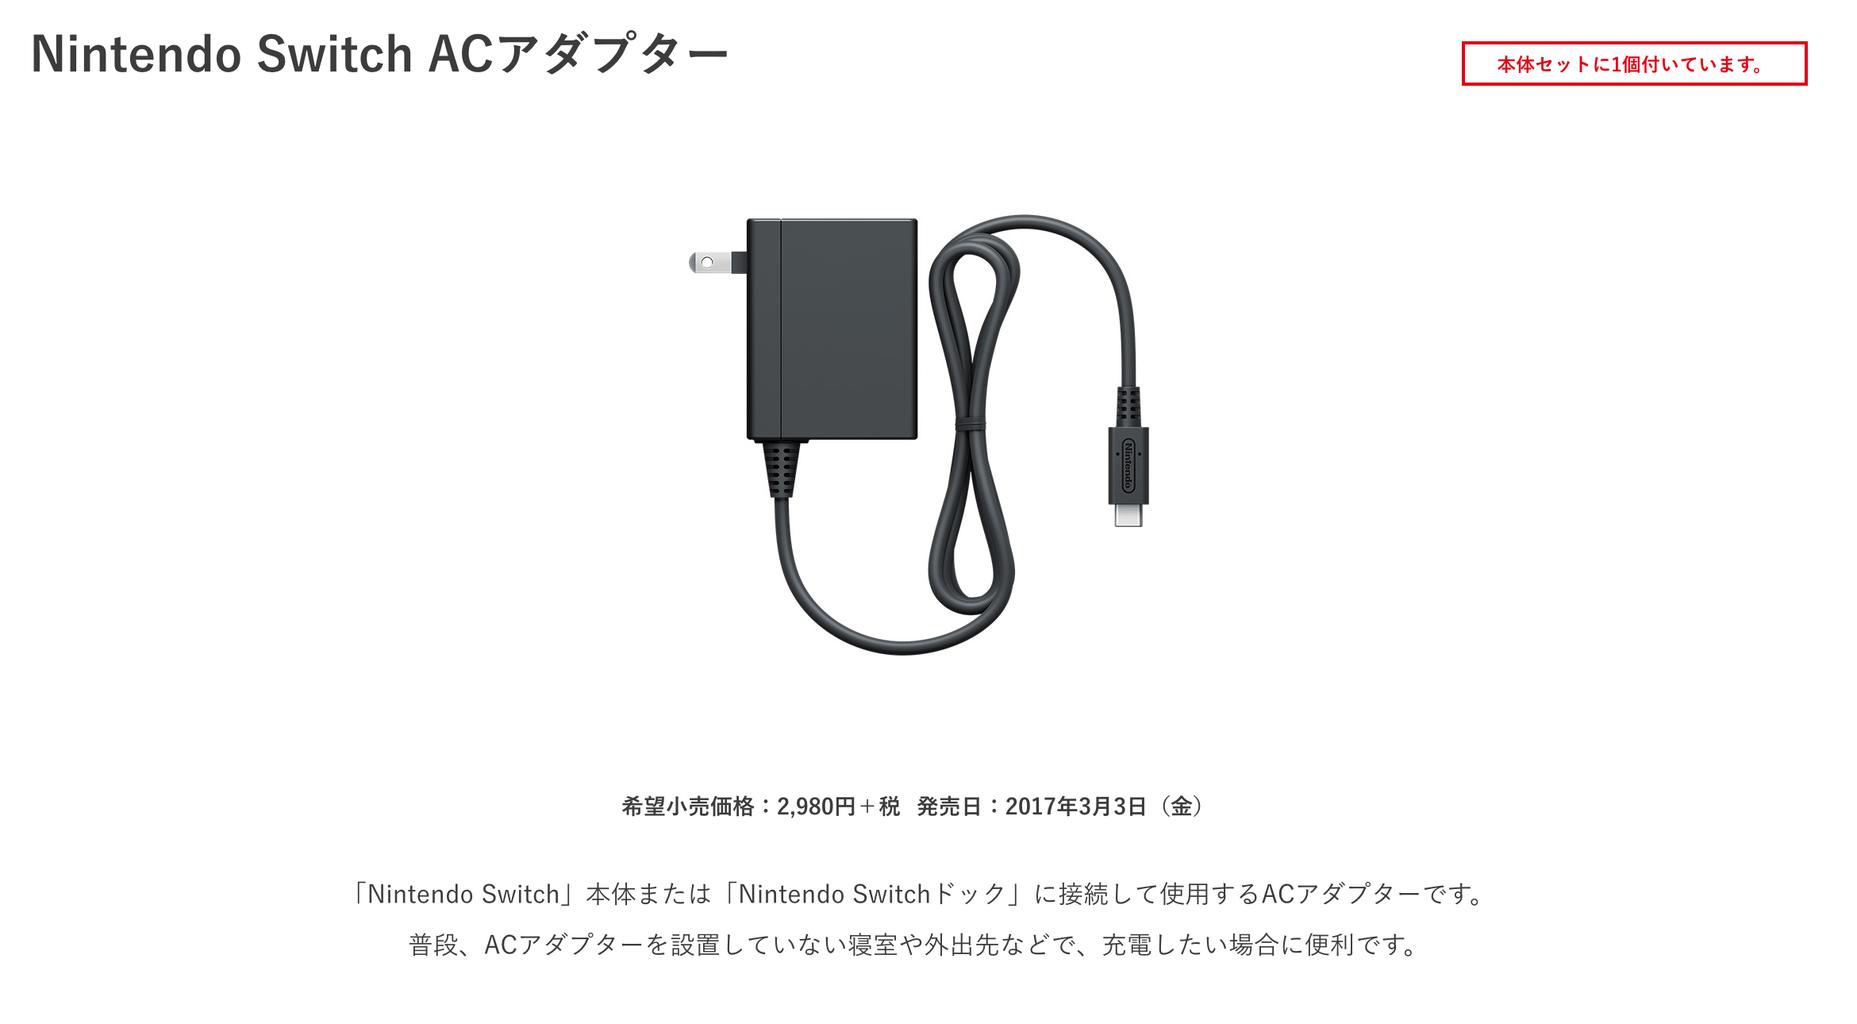 Nintendo Switch Ac Blog